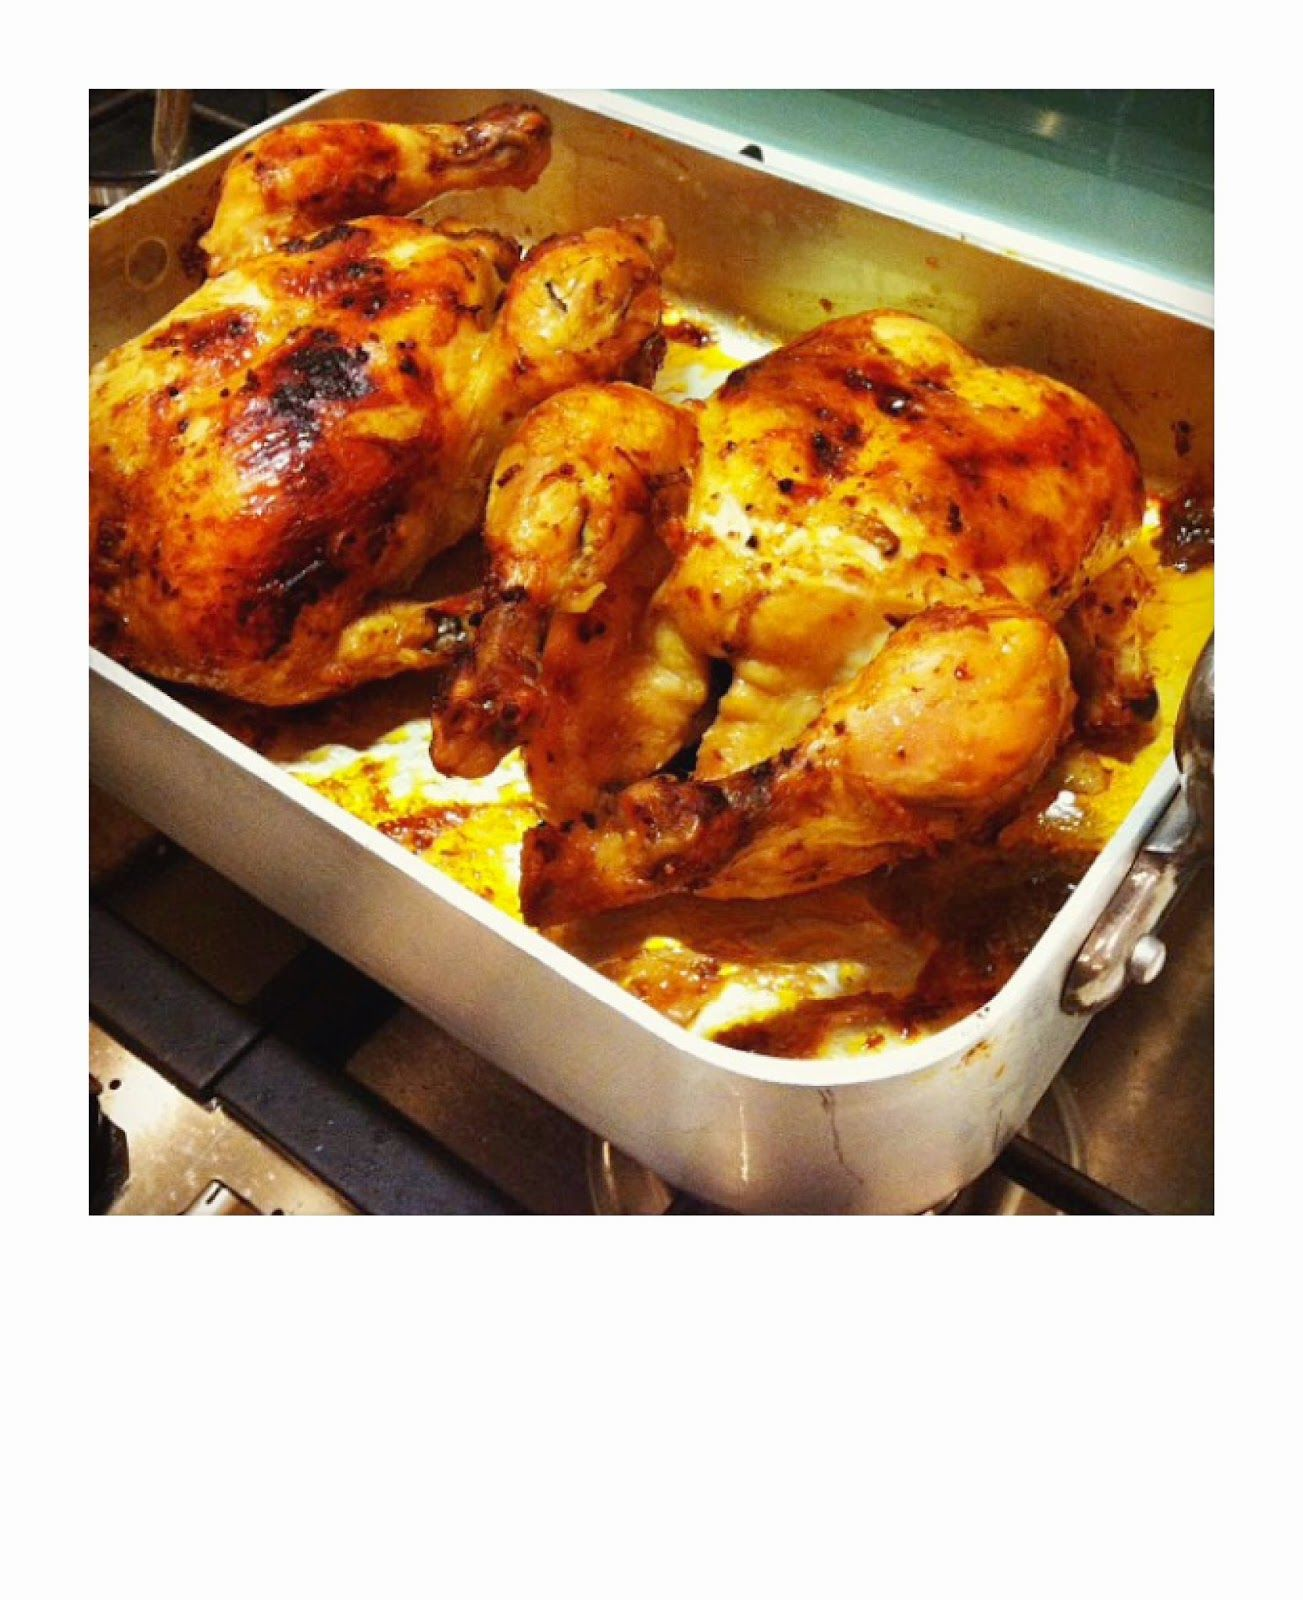 Ovnsstekt kylling, rotassery style